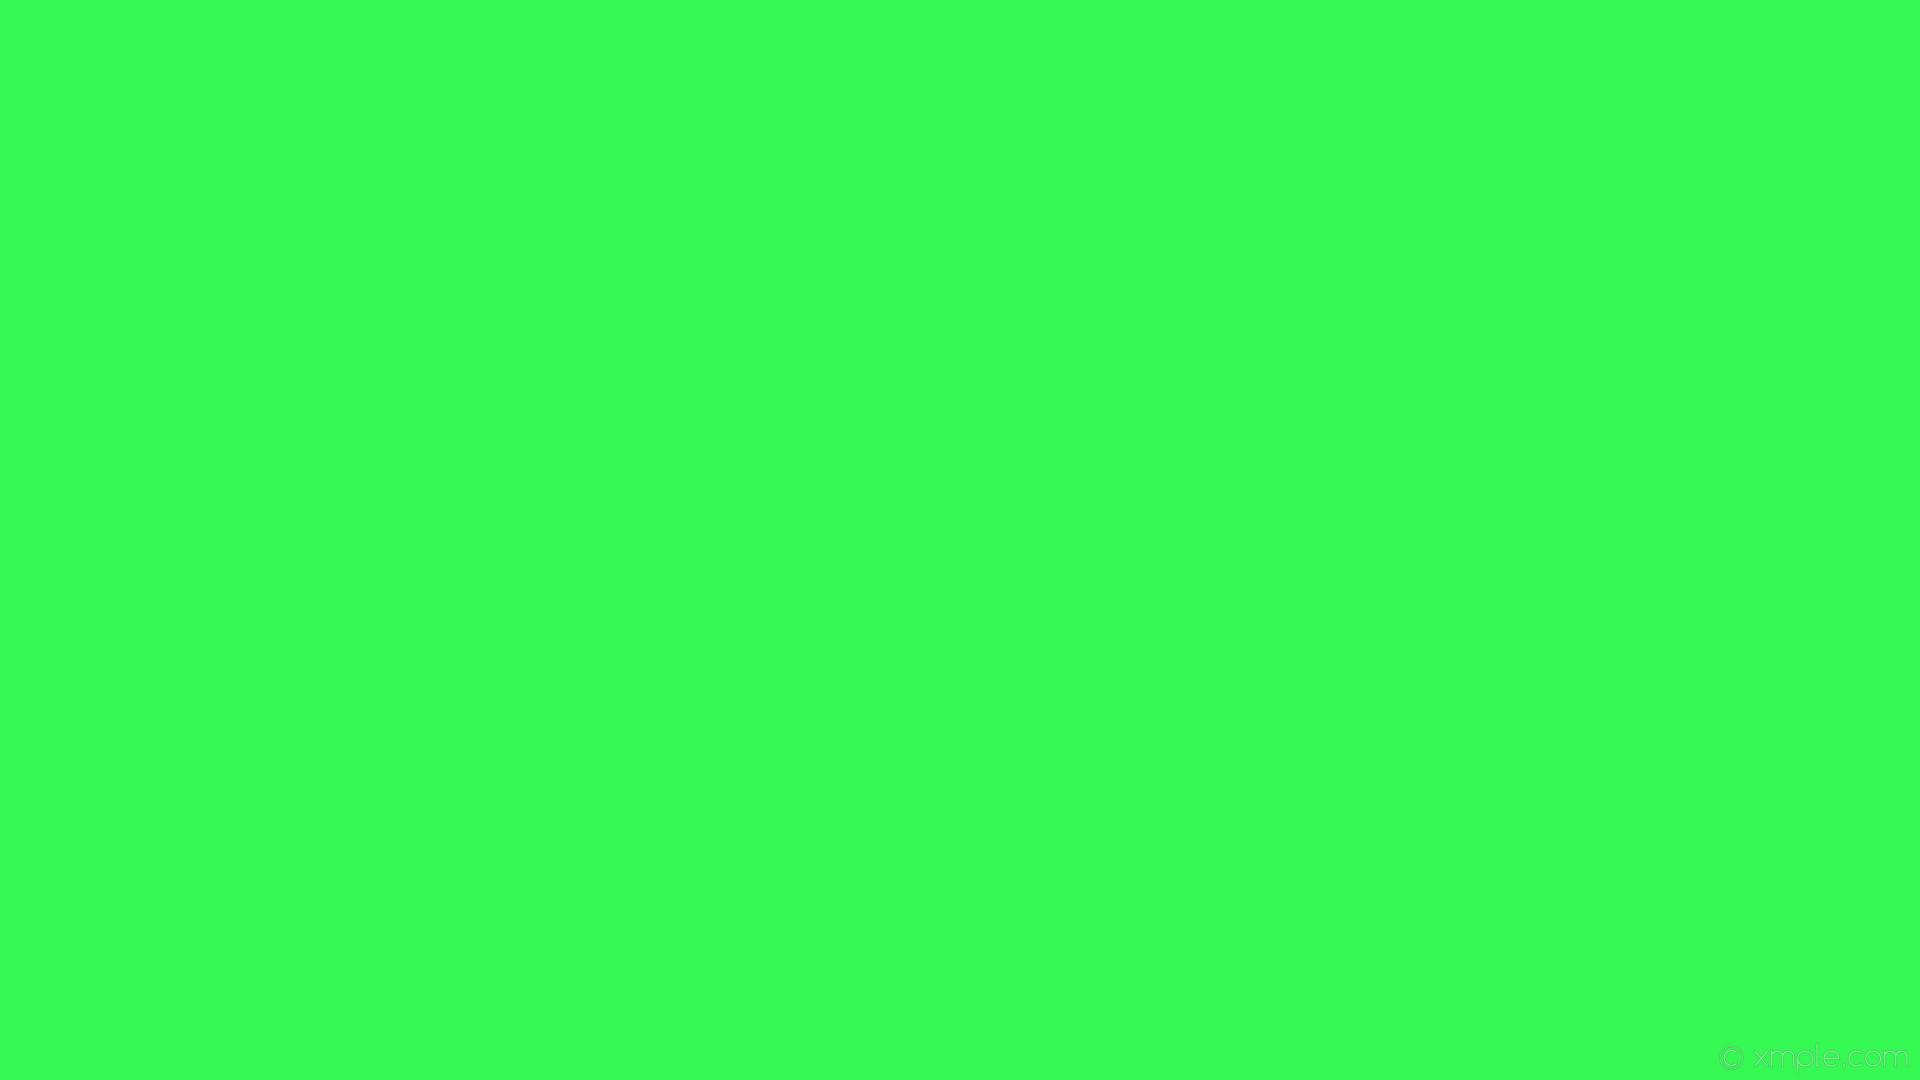 green plain wallpaper download labzada wallpaper